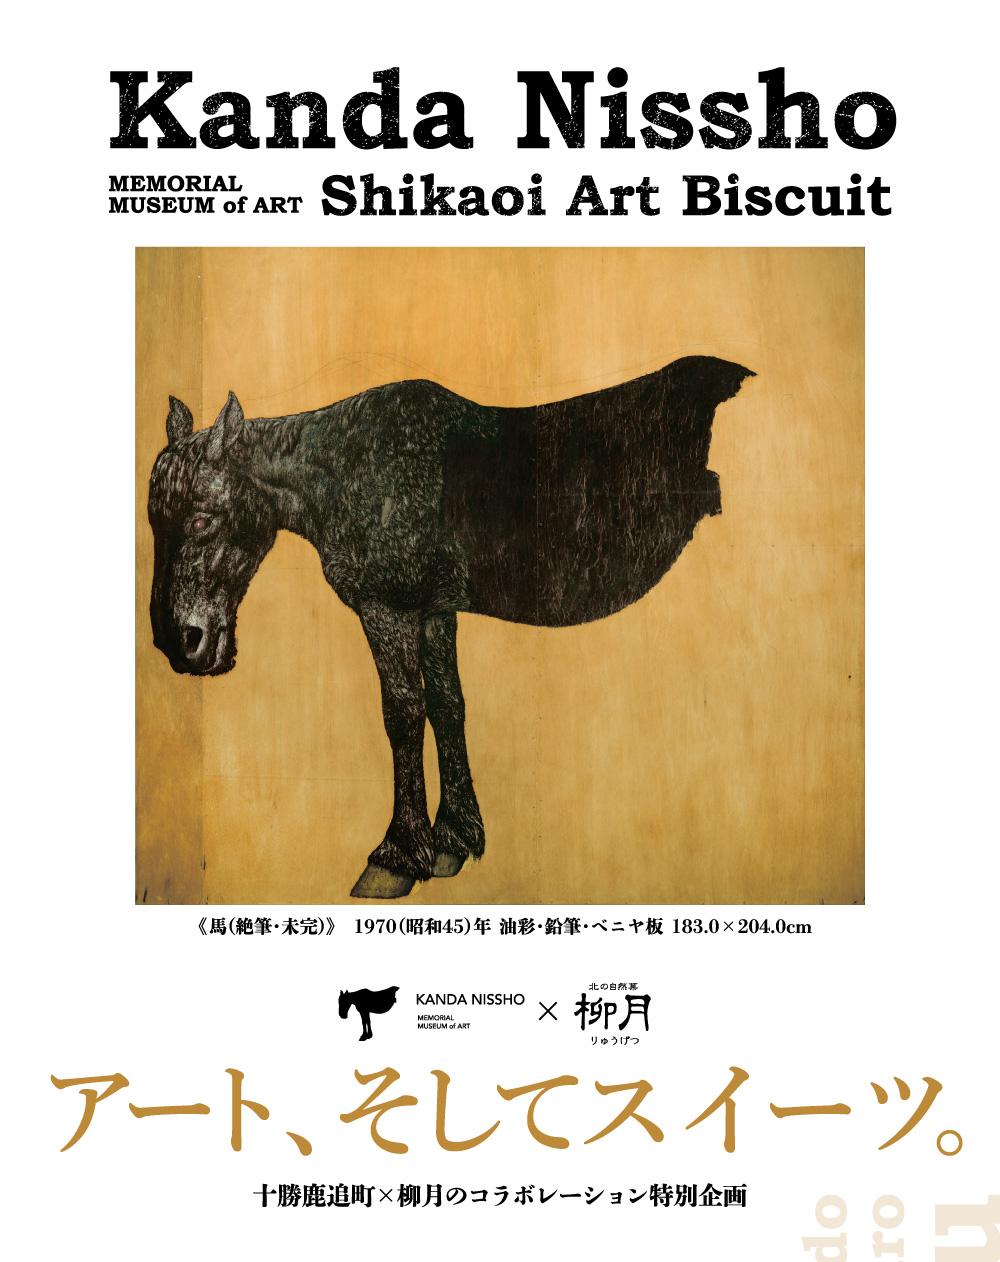 Kanda Nissho MEMORIAL MUSEUM of ART Shikaoi Art Biscuit アート、そしてスイーツ